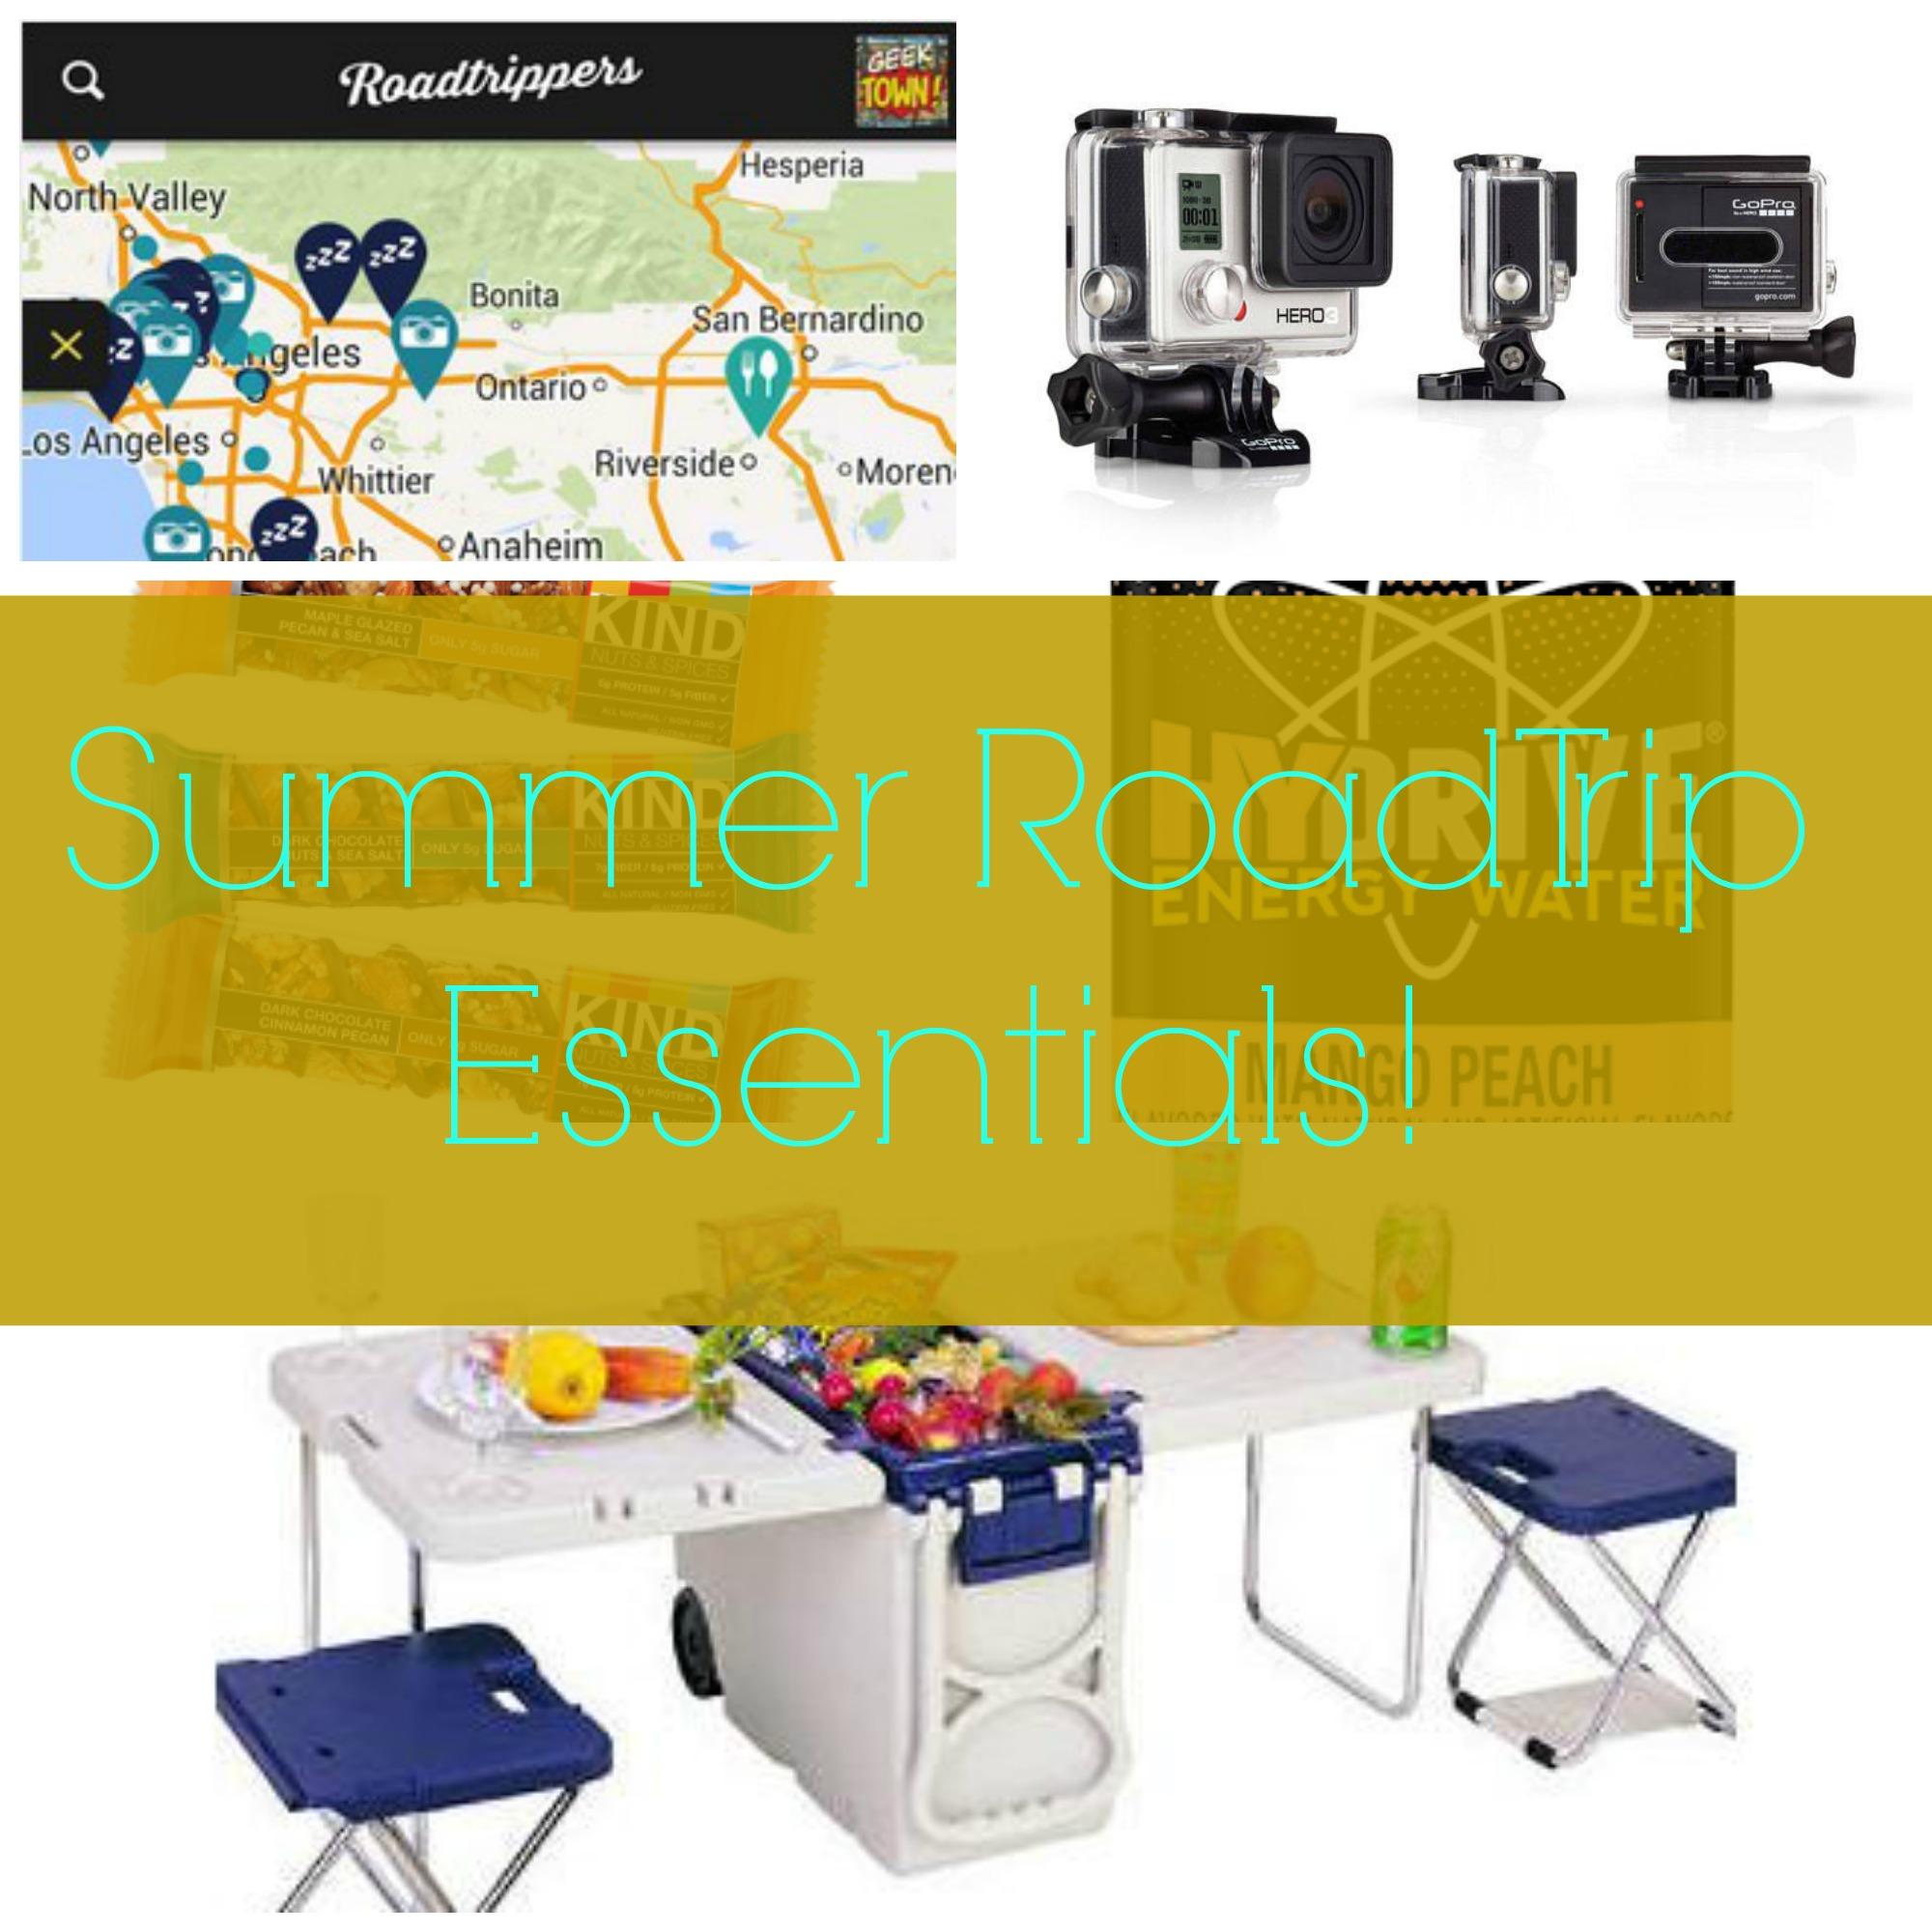 summer-road-trip-essentials